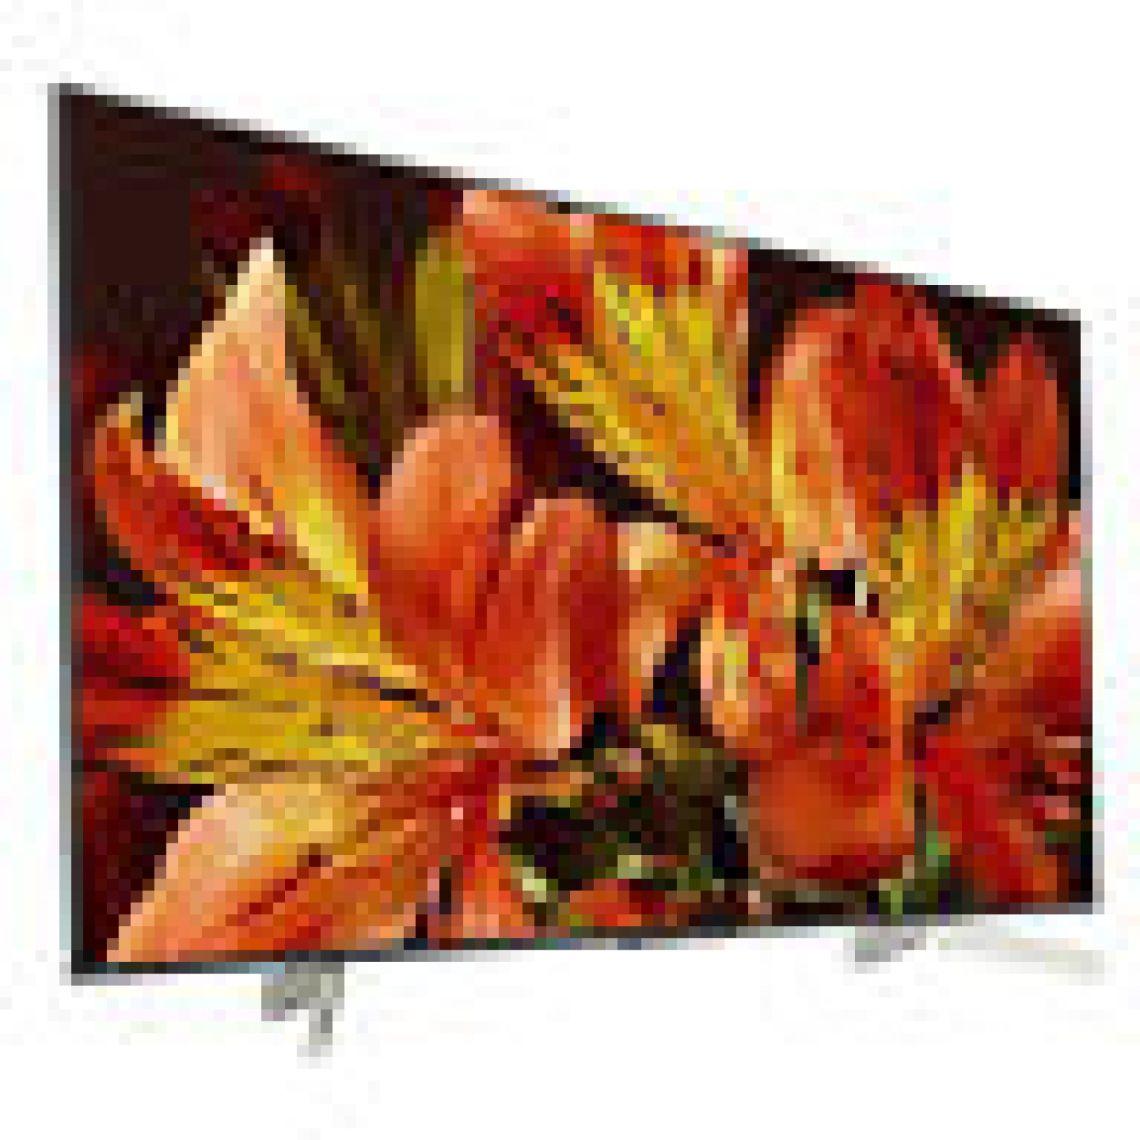 Sony XBR85X850F 85-Inch 4K Ultra HD Smart LED TV (2018 Model) 27242909939 | eBay